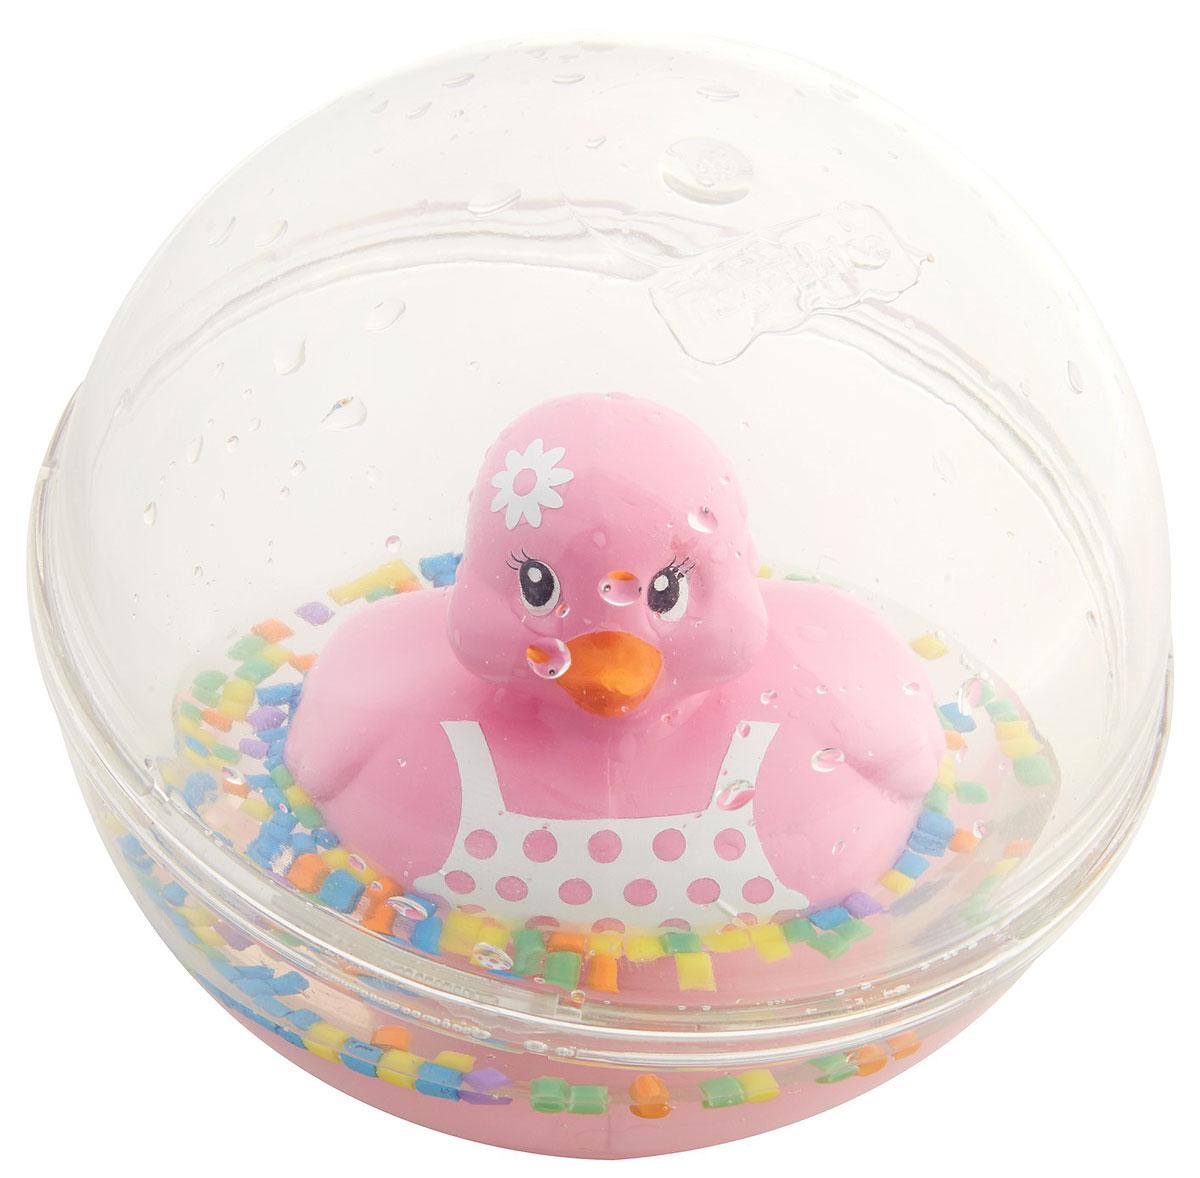 Fisher-Price Развивающая игрушка Уточка цвет розовый роутер tp link deco m9 plus 3 pack ac2200 mesh wi fi система для умного дома